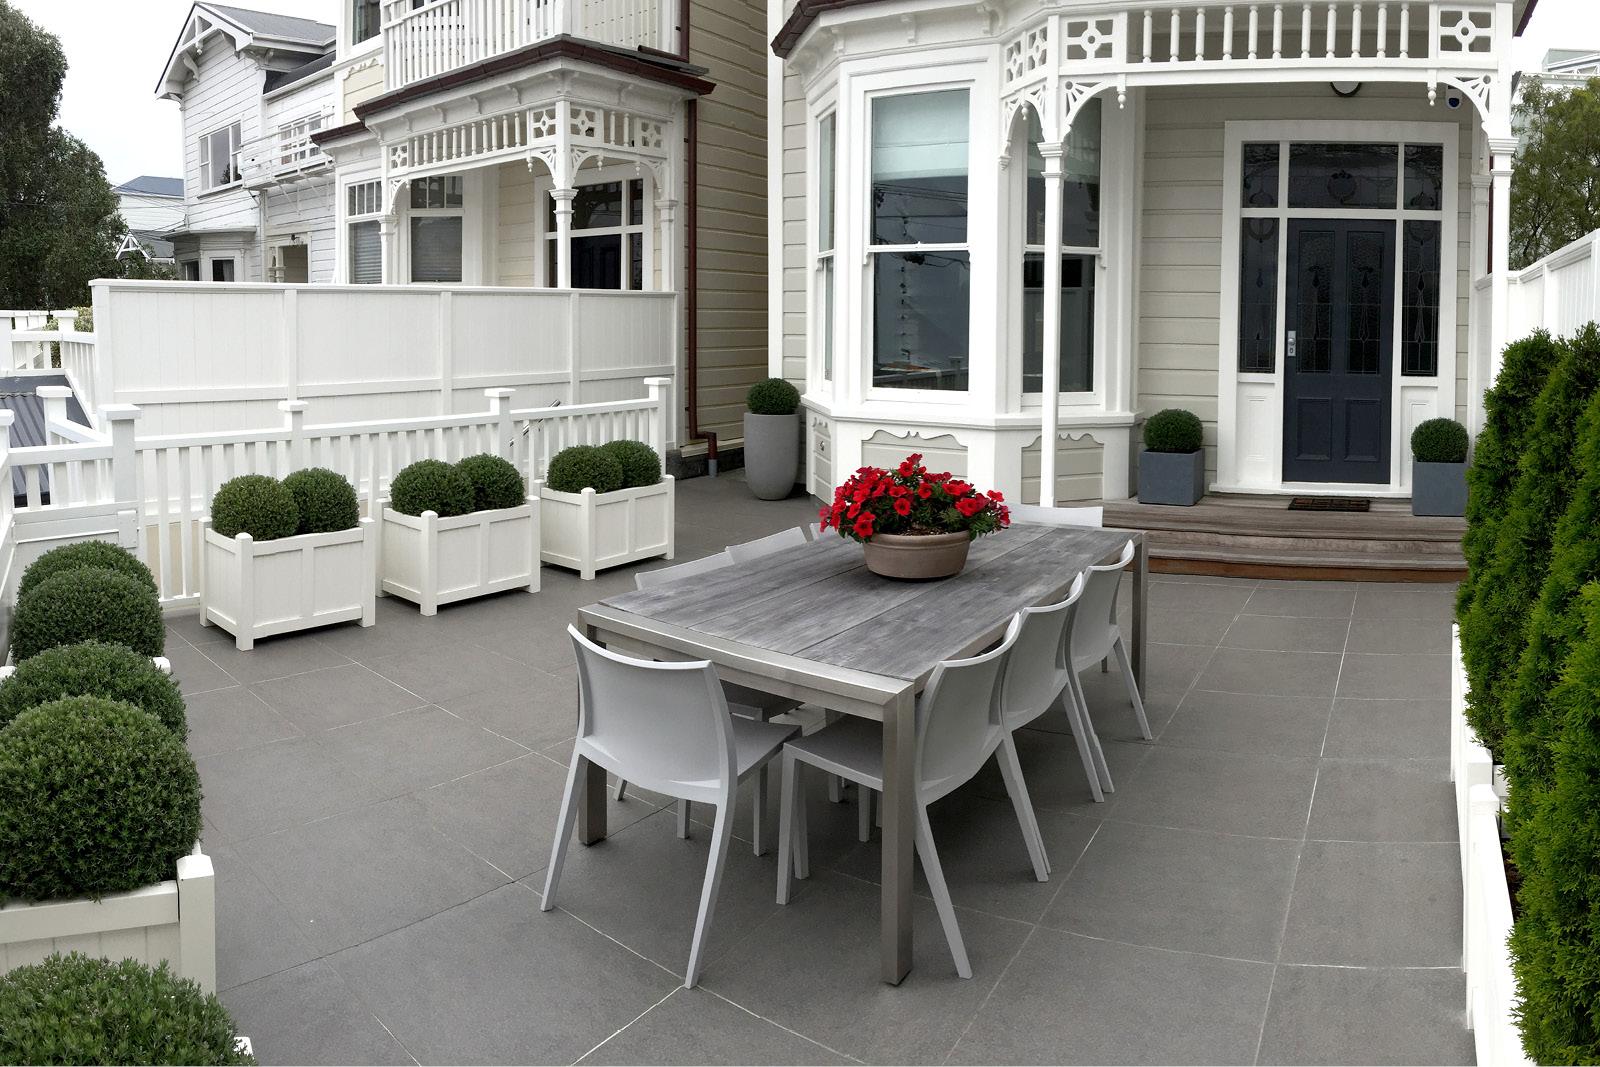 Urban_Courtyard_Formal_Garden_MNLA_2.jpg